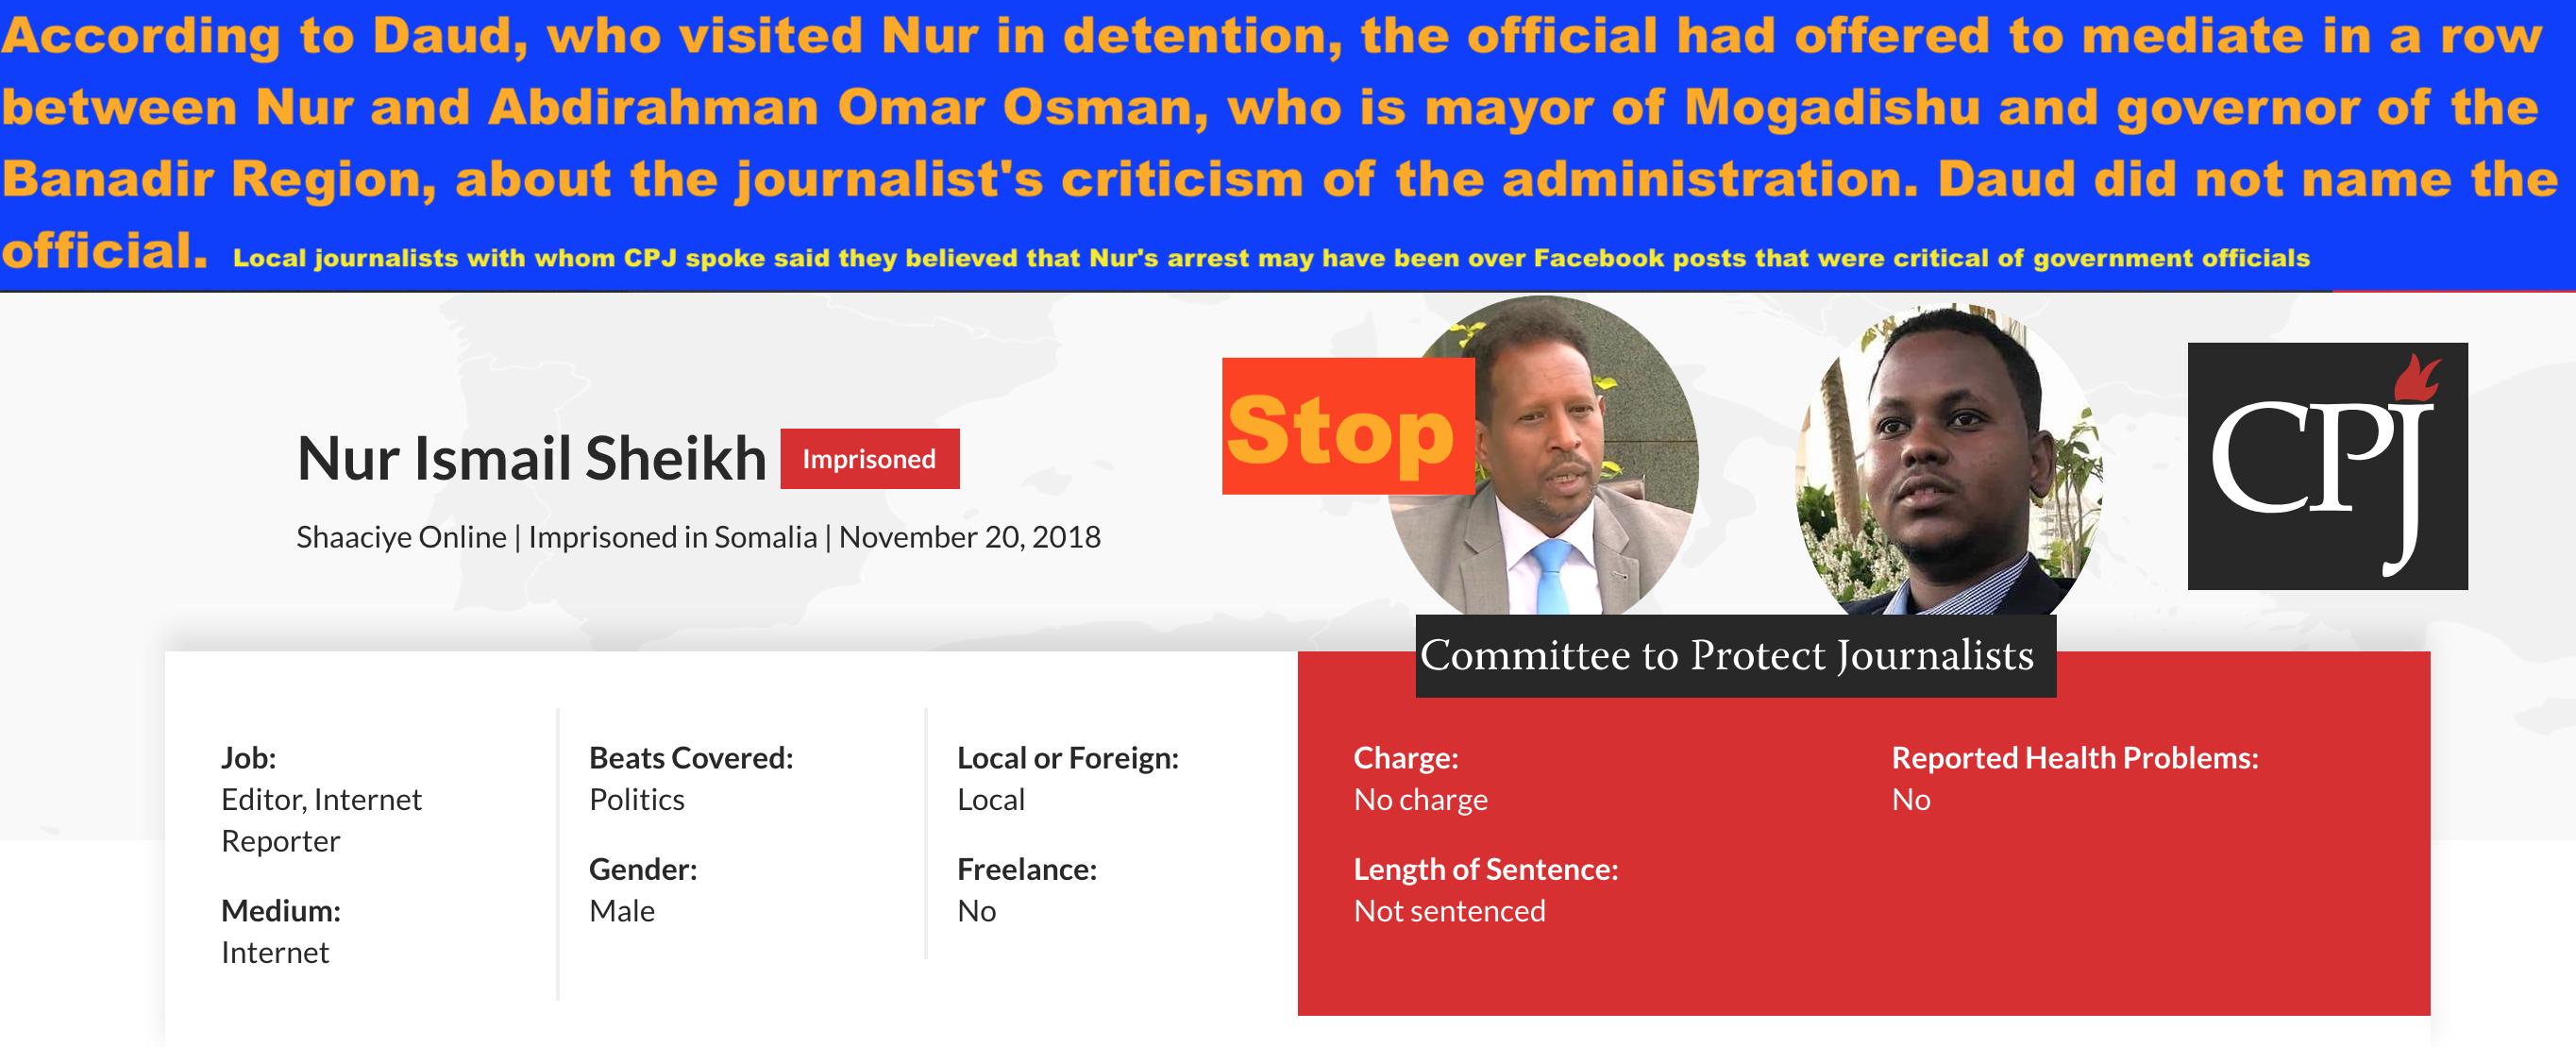 CPJ Report on the harassment & violations of media rights by Mogadishu Mayor Abdirahman Osman.